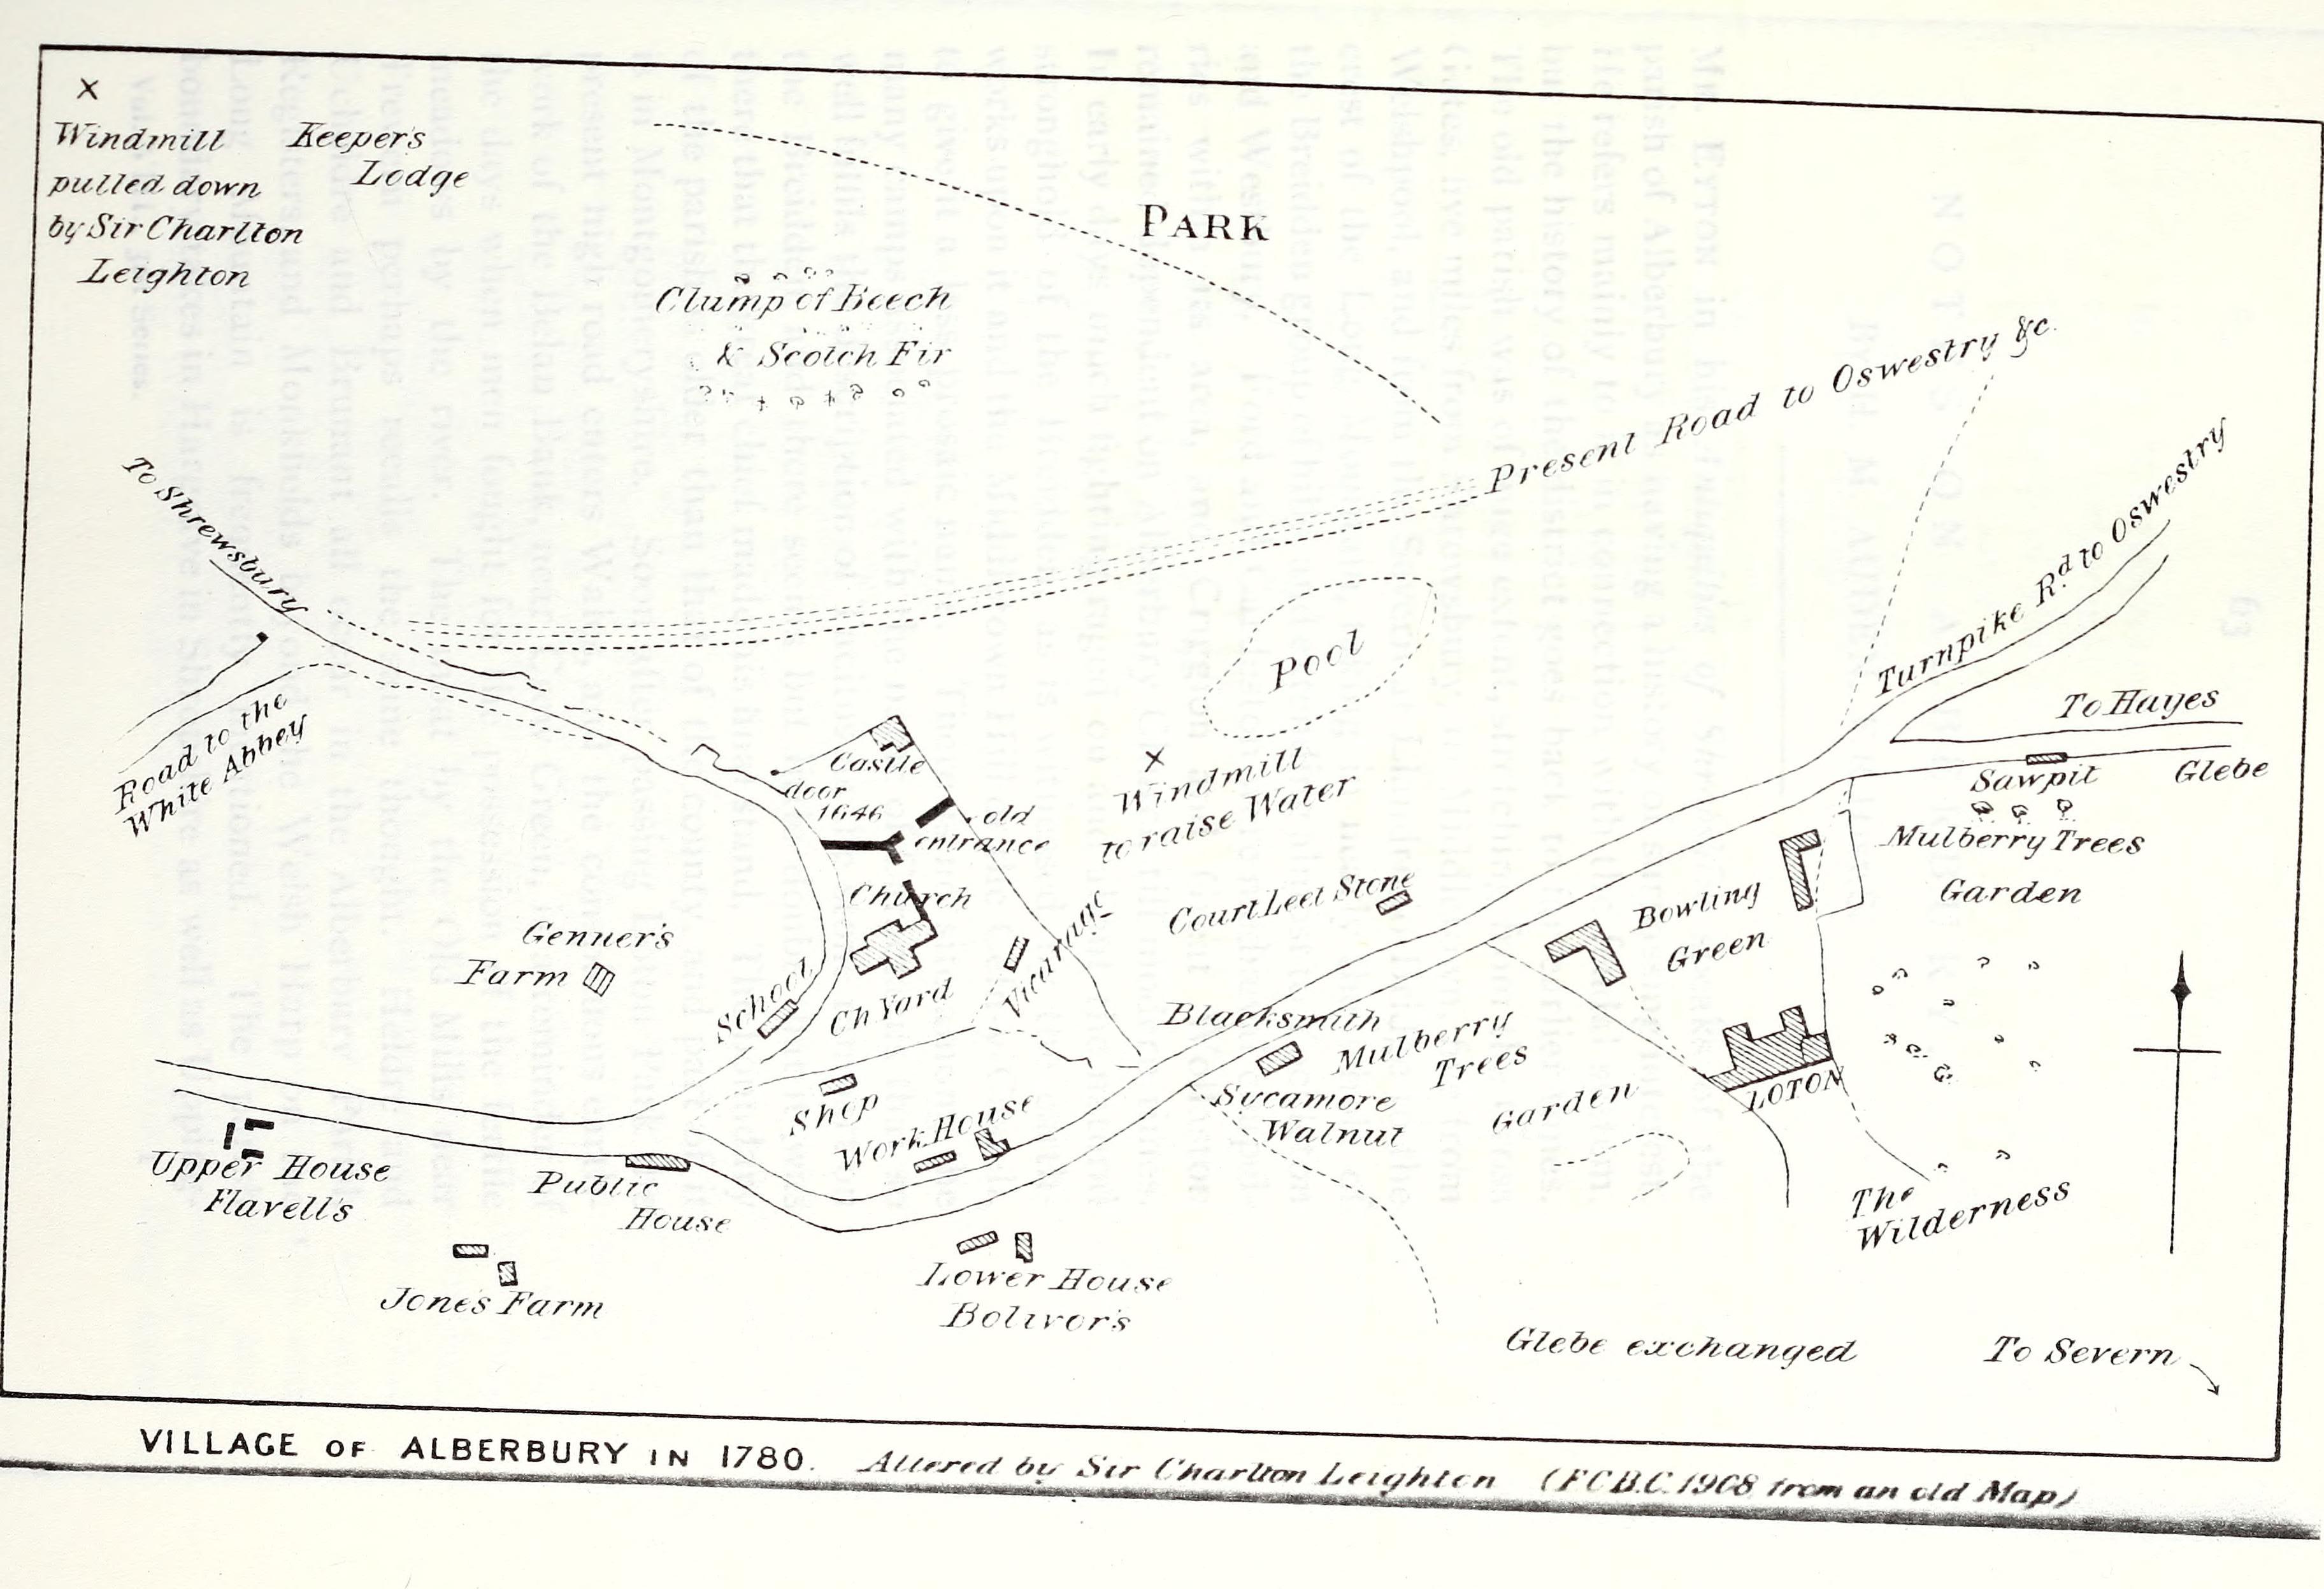 Map of Alberbury in 1780